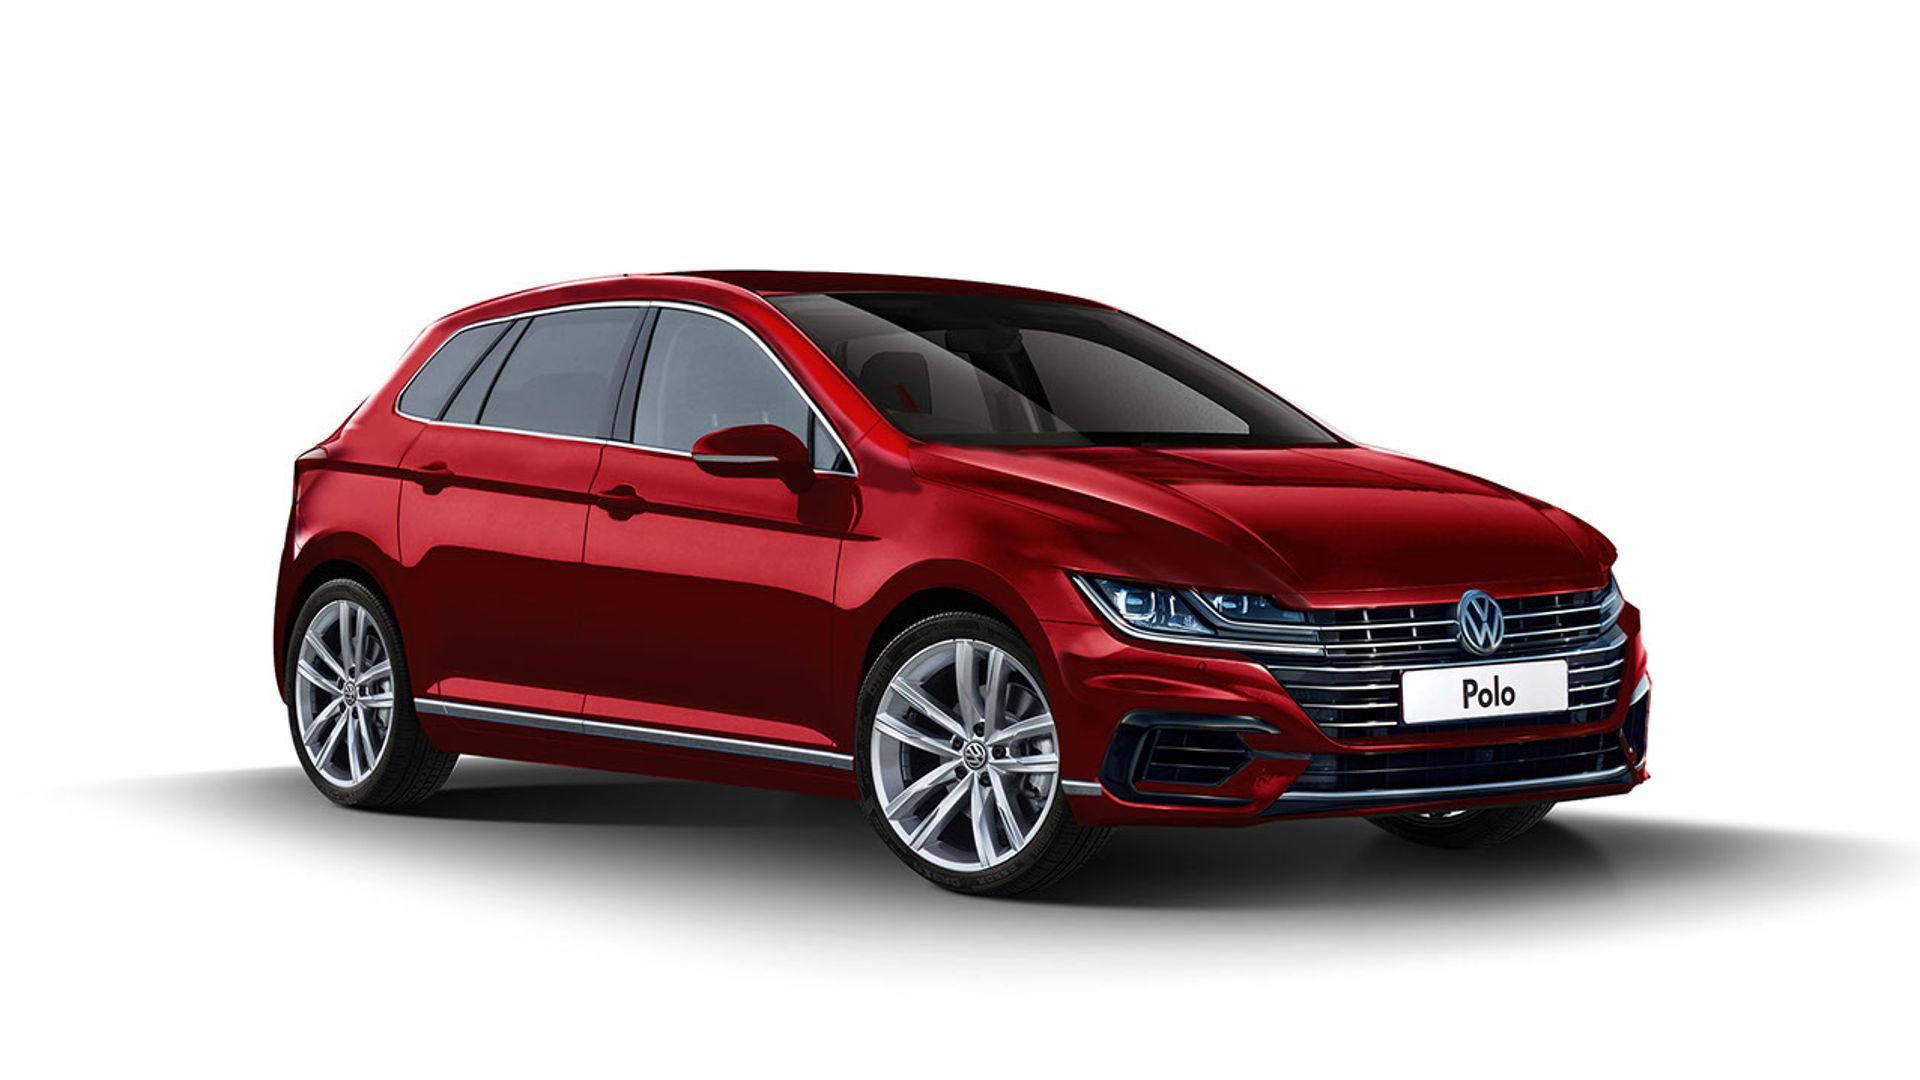 2018 VW Polo Looks Elegant In New Rendering